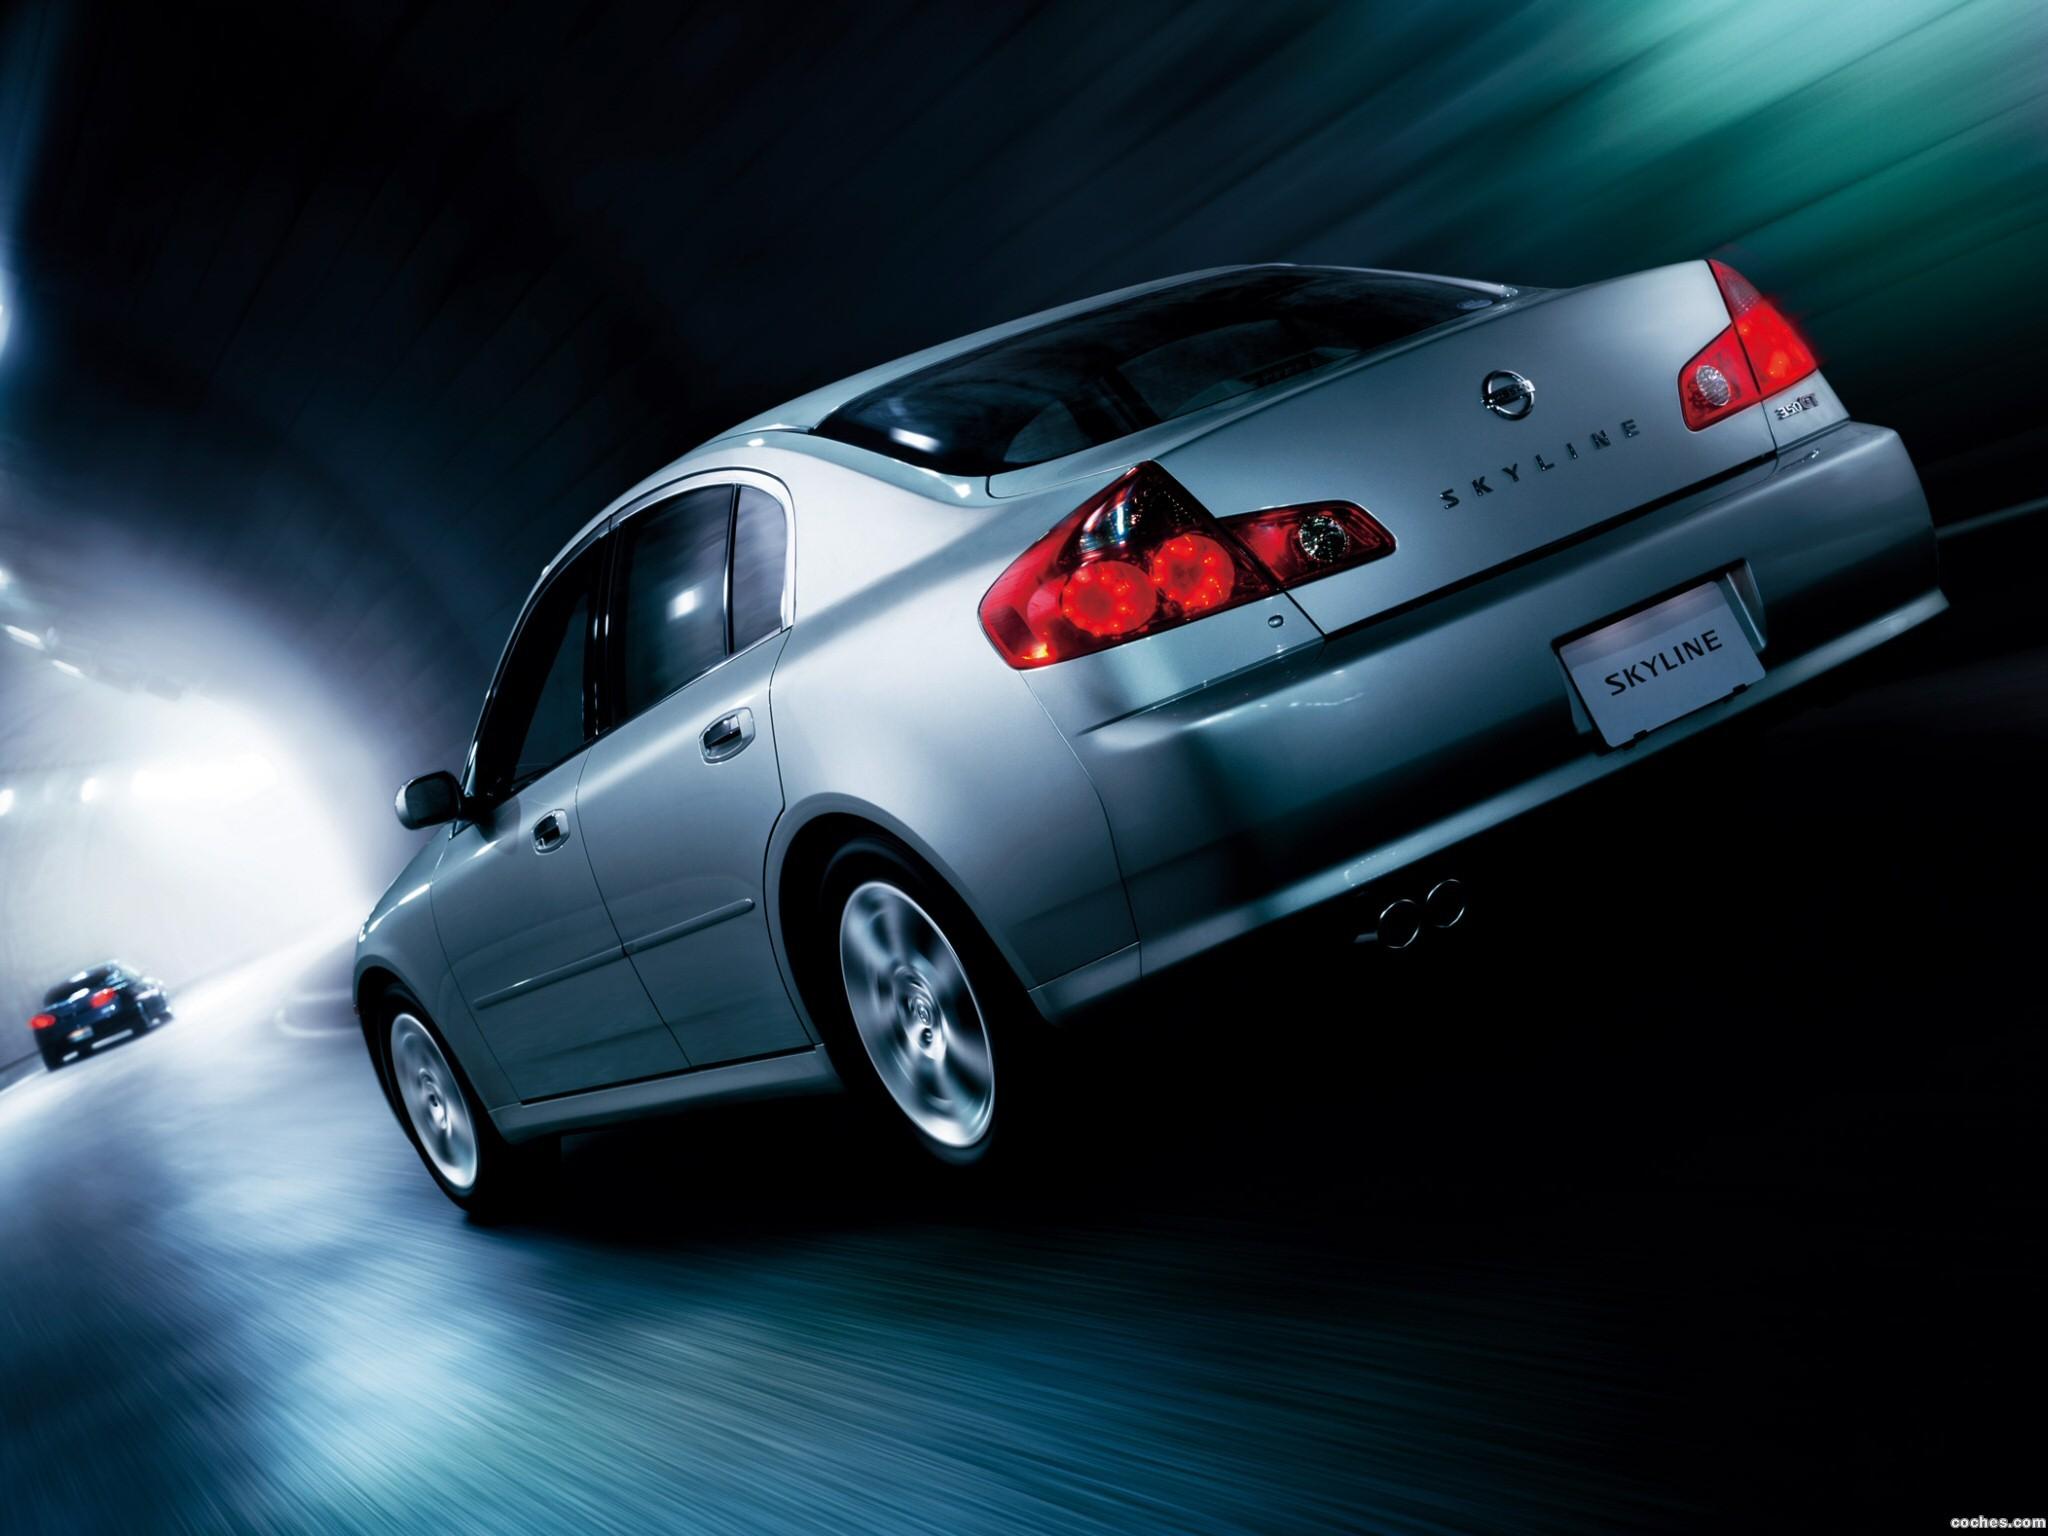 Foto 1 de Nissan Skyline 2001